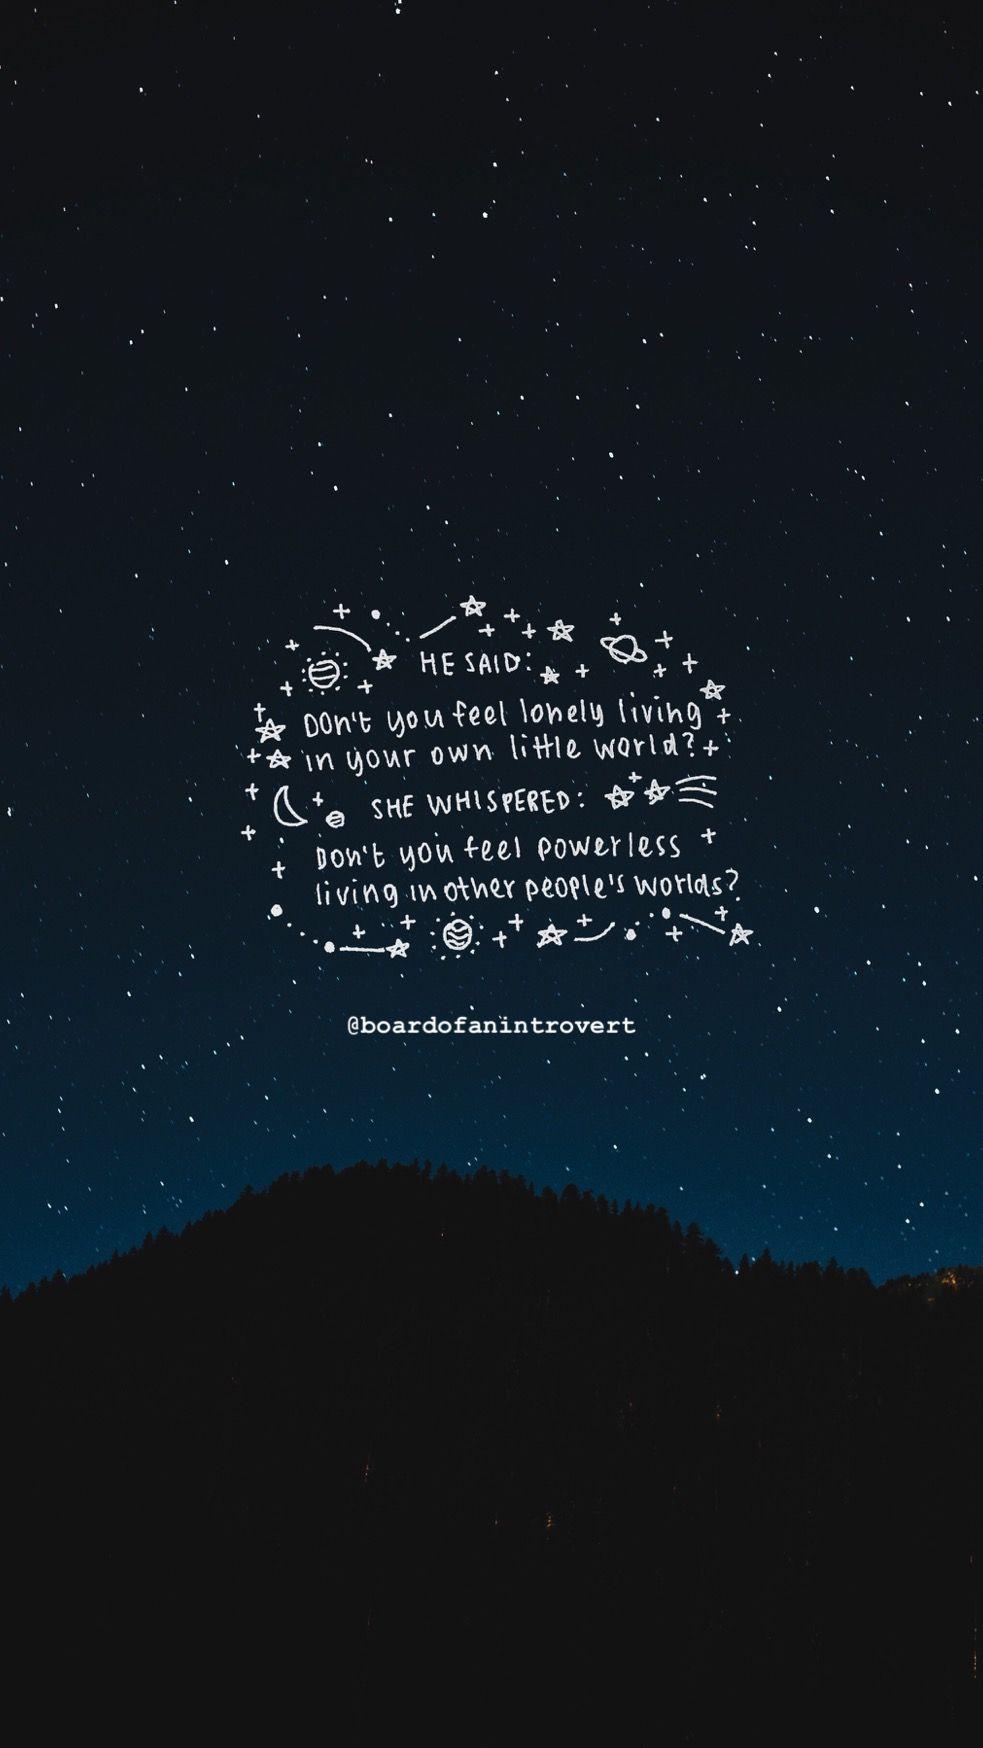 Boardofanintrovert Https Diaryofamoonchild Tumblr Com Pretty Quotes Galaxy Quotes Words Quotes